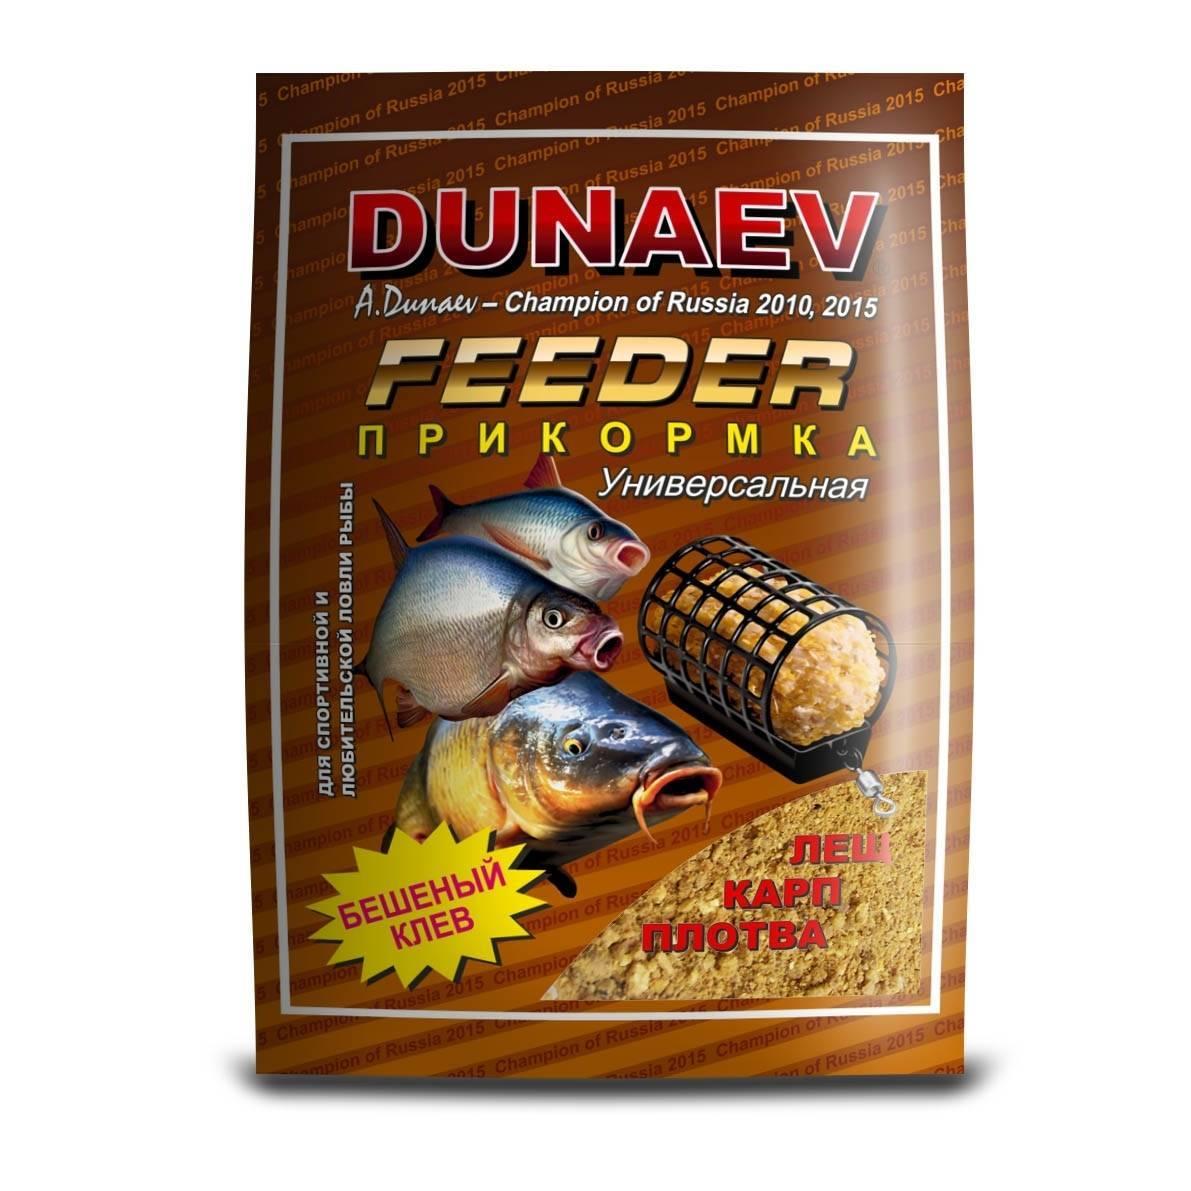 Прикормка дунаев: отзывы о бренде dunaev, виды (премиум, зимняя, спорт) | berlogakarelia.ru